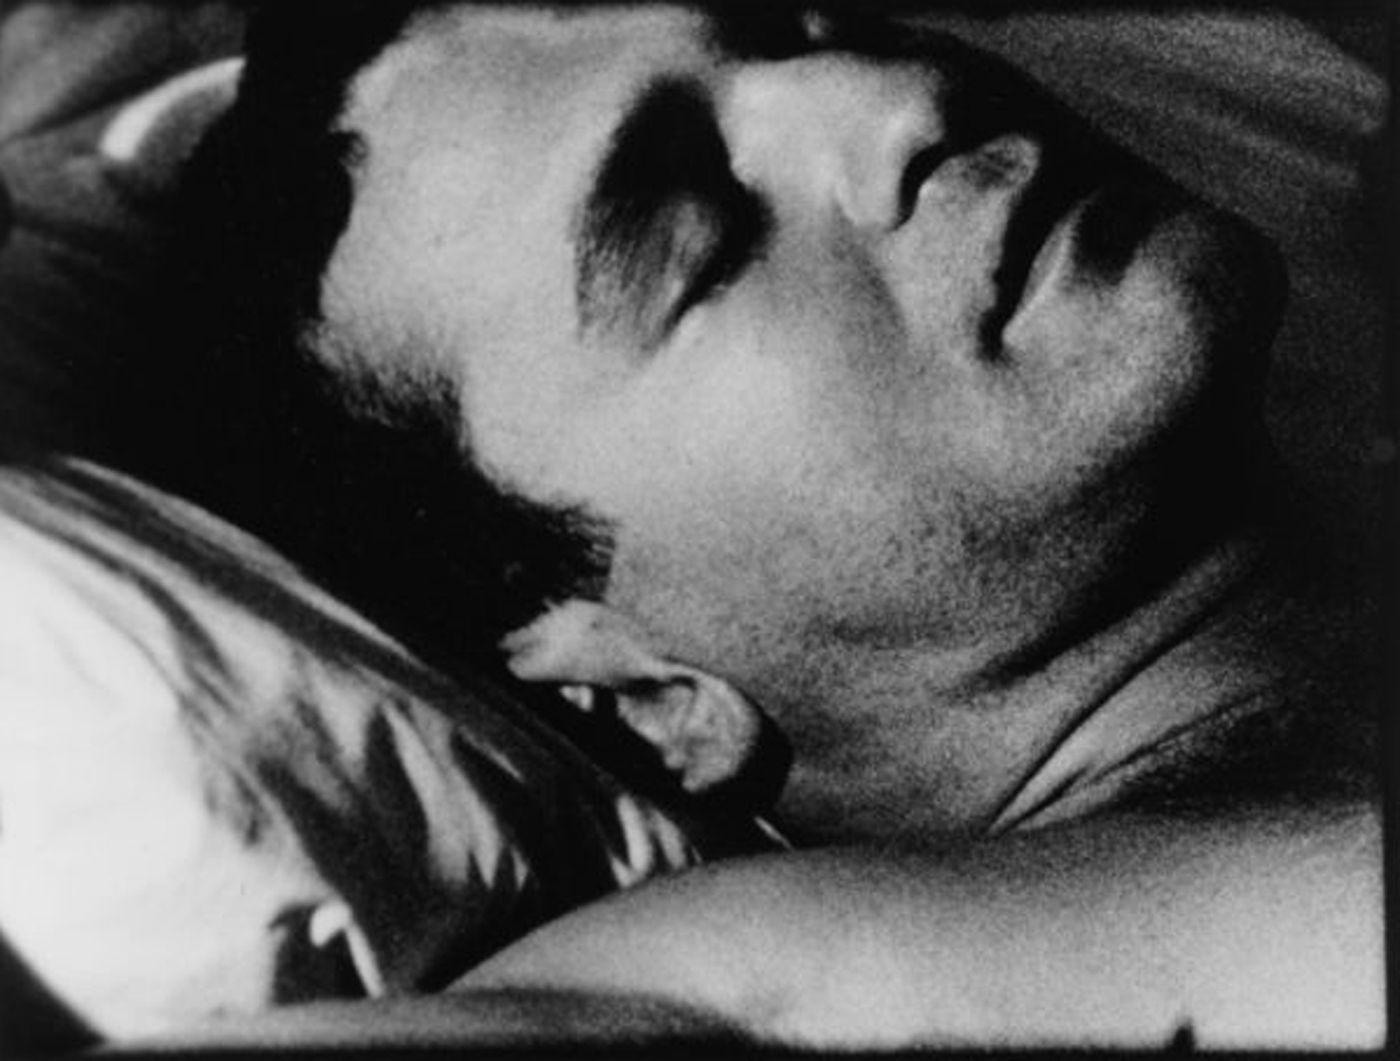 Still from Sleep film by Andy Warhol